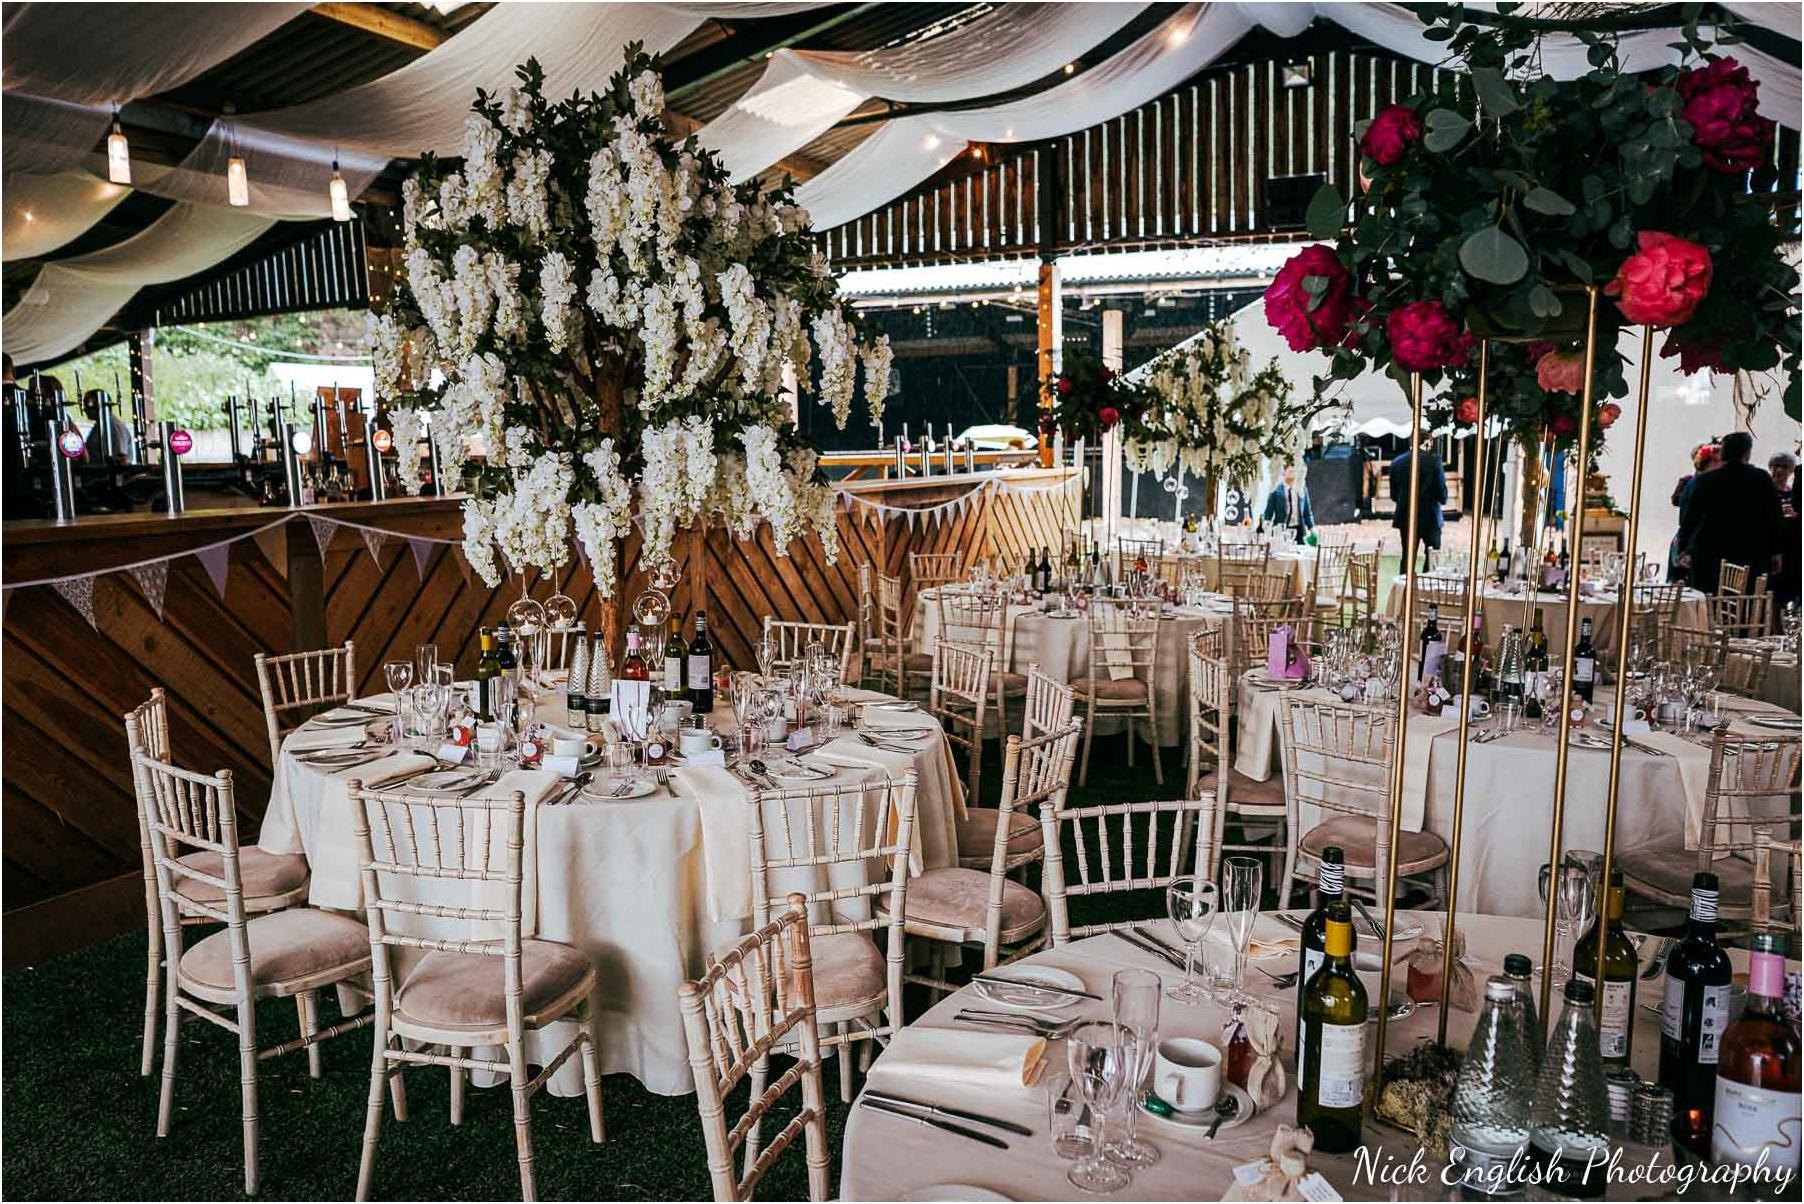 Whitebottom_Farm_Wedding_Manchester_Photograph-62.jpg